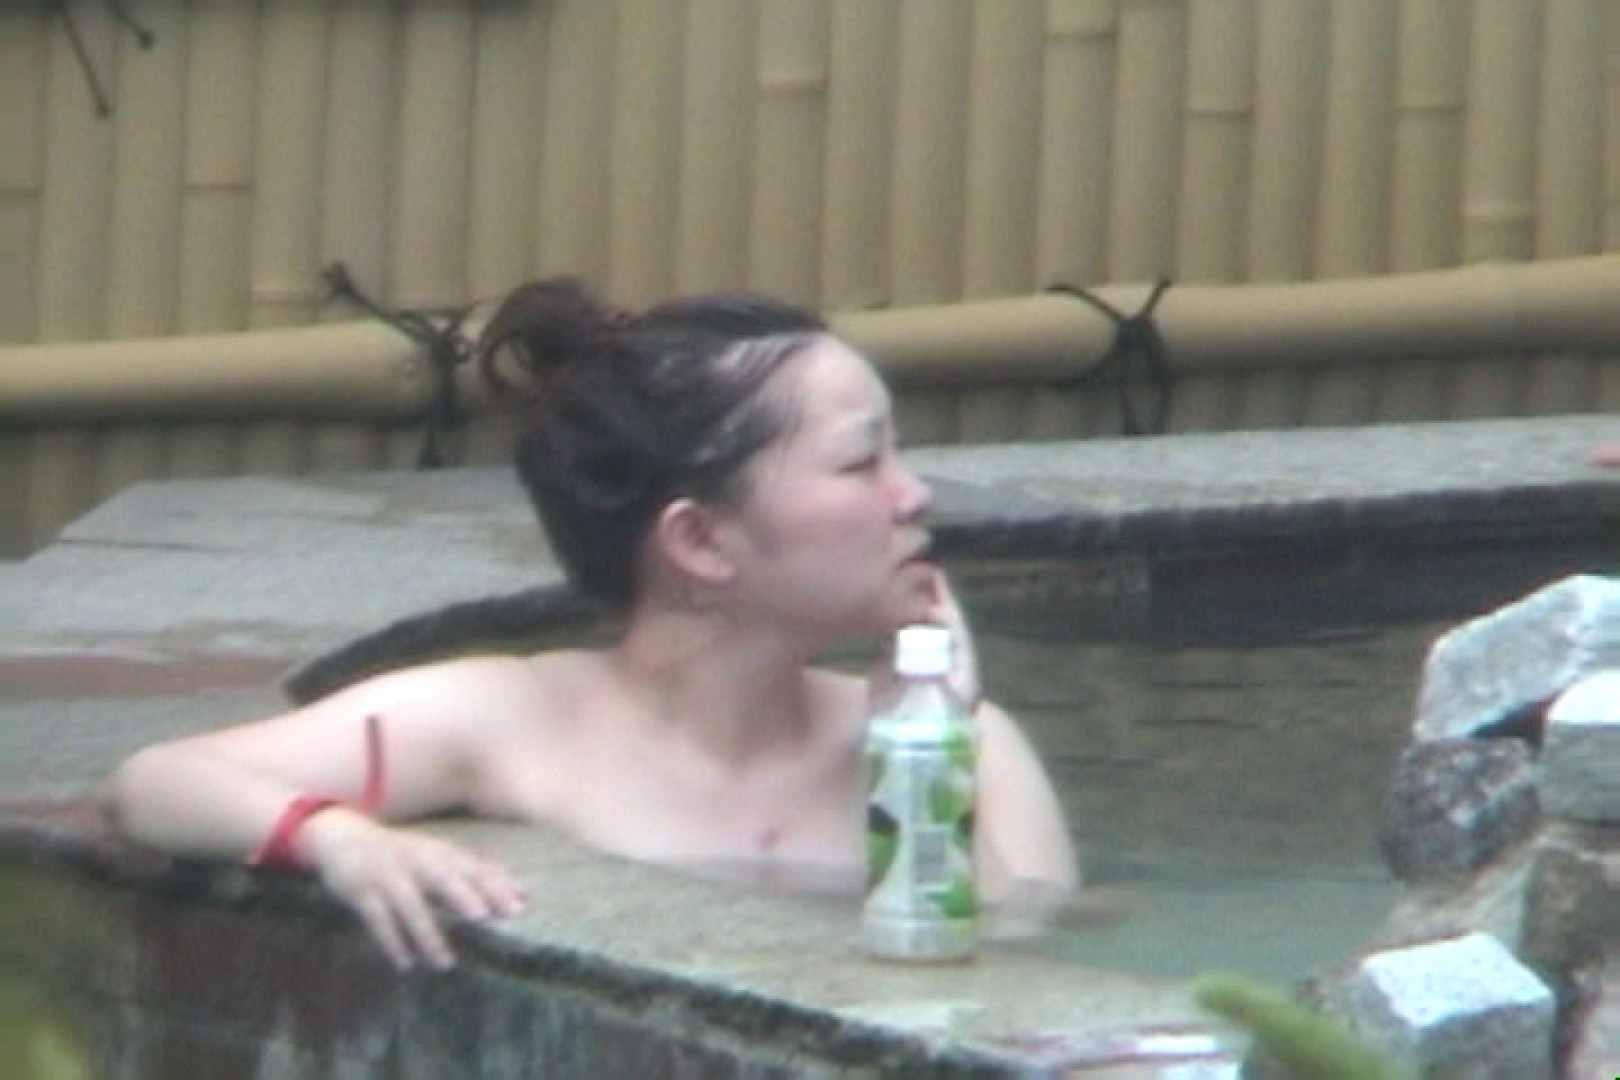 Aquaな露天風呂Vol.47【VIP限定】 露天風呂突入 オマンコ無修正動画無料 94pic 41